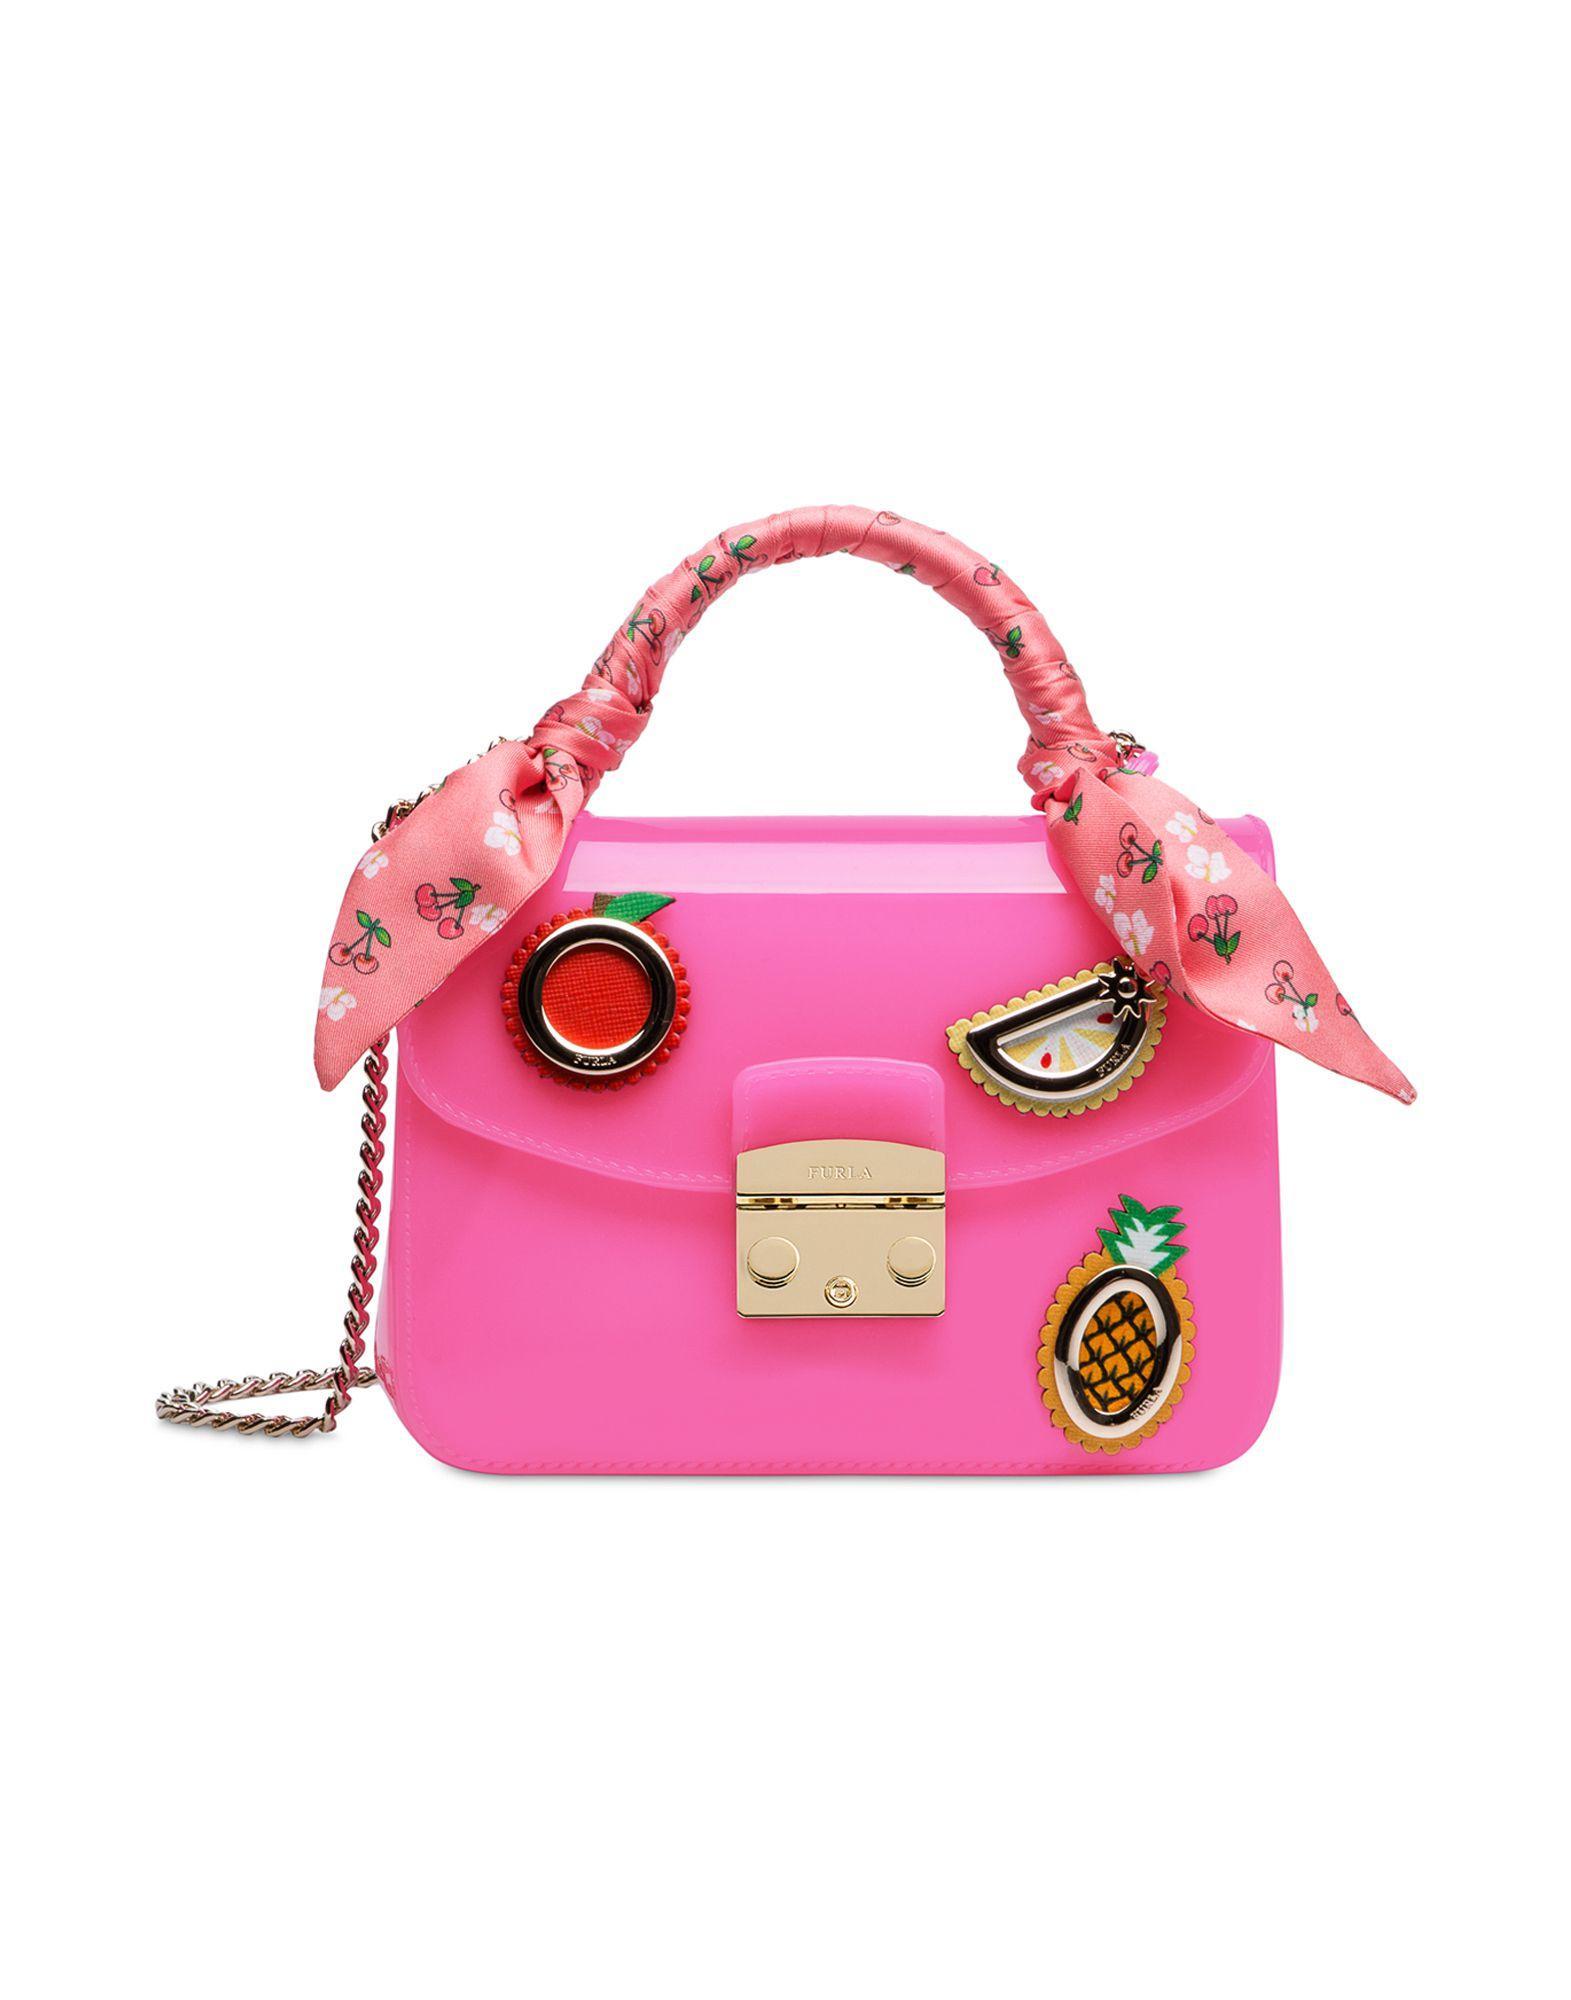 Furla Handbags In Fuchsia